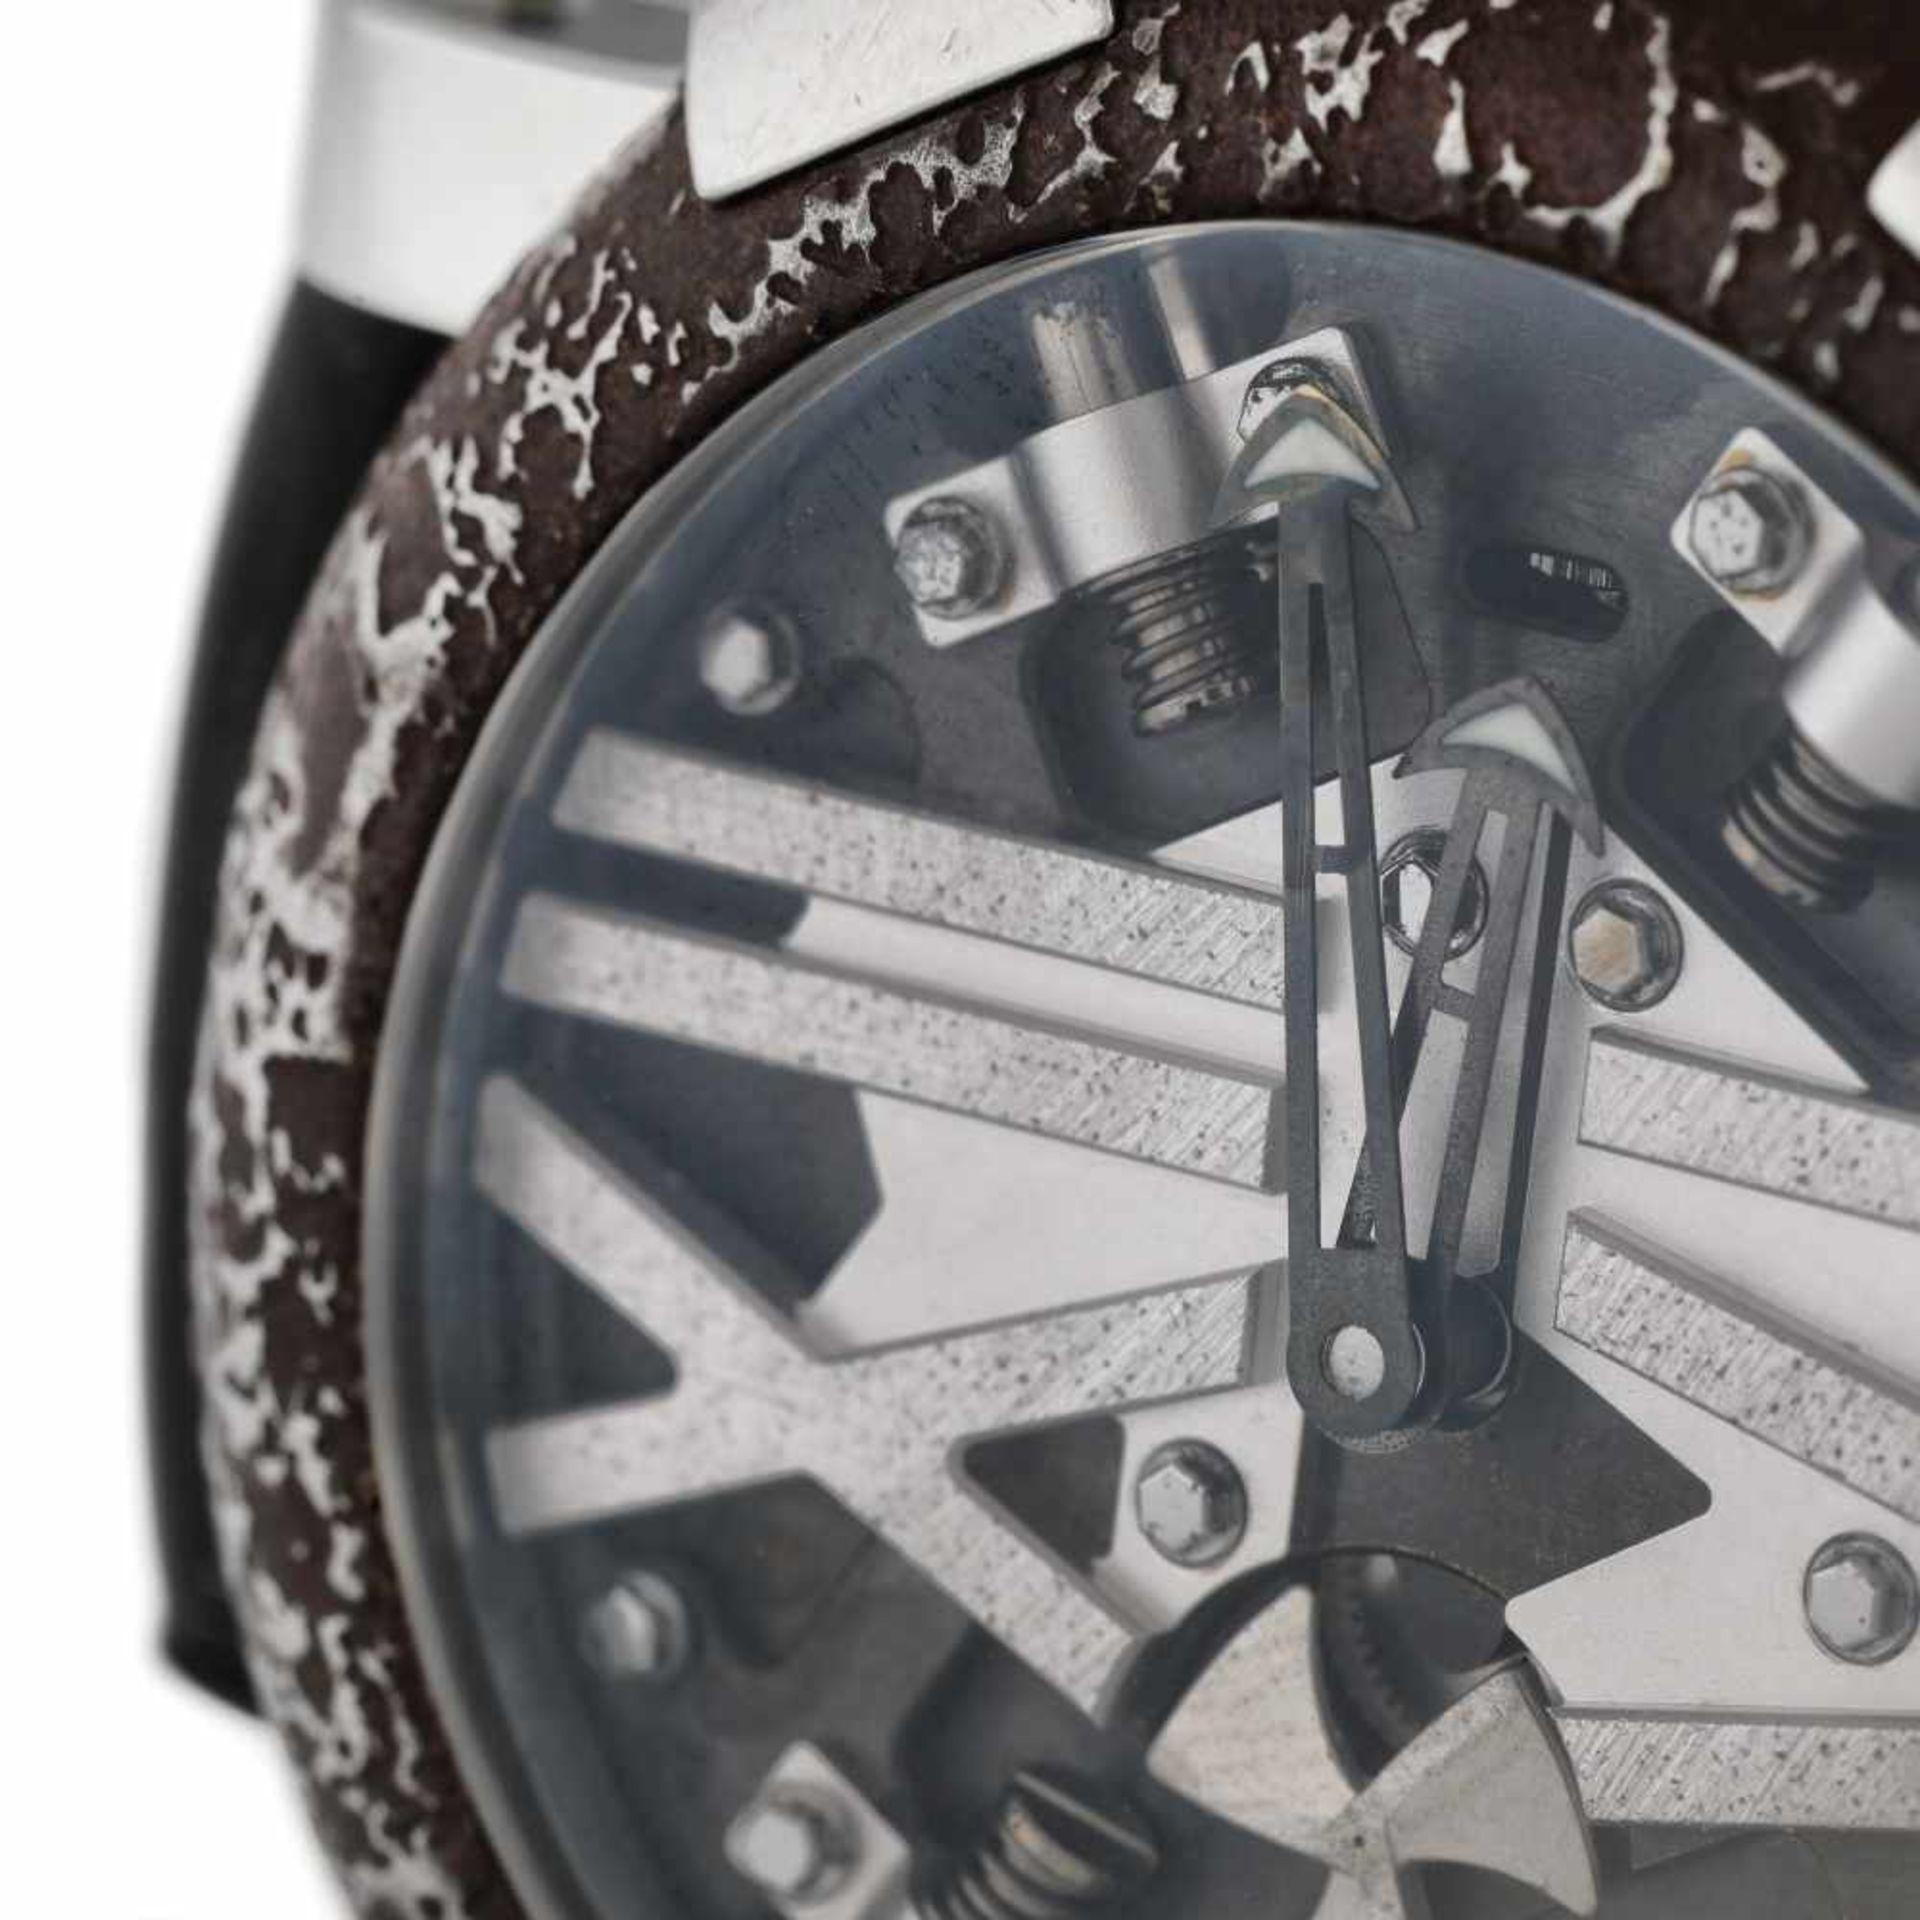 Romain Jerome Titanic-DNA wristwatch, men - Bild 3 aus 3